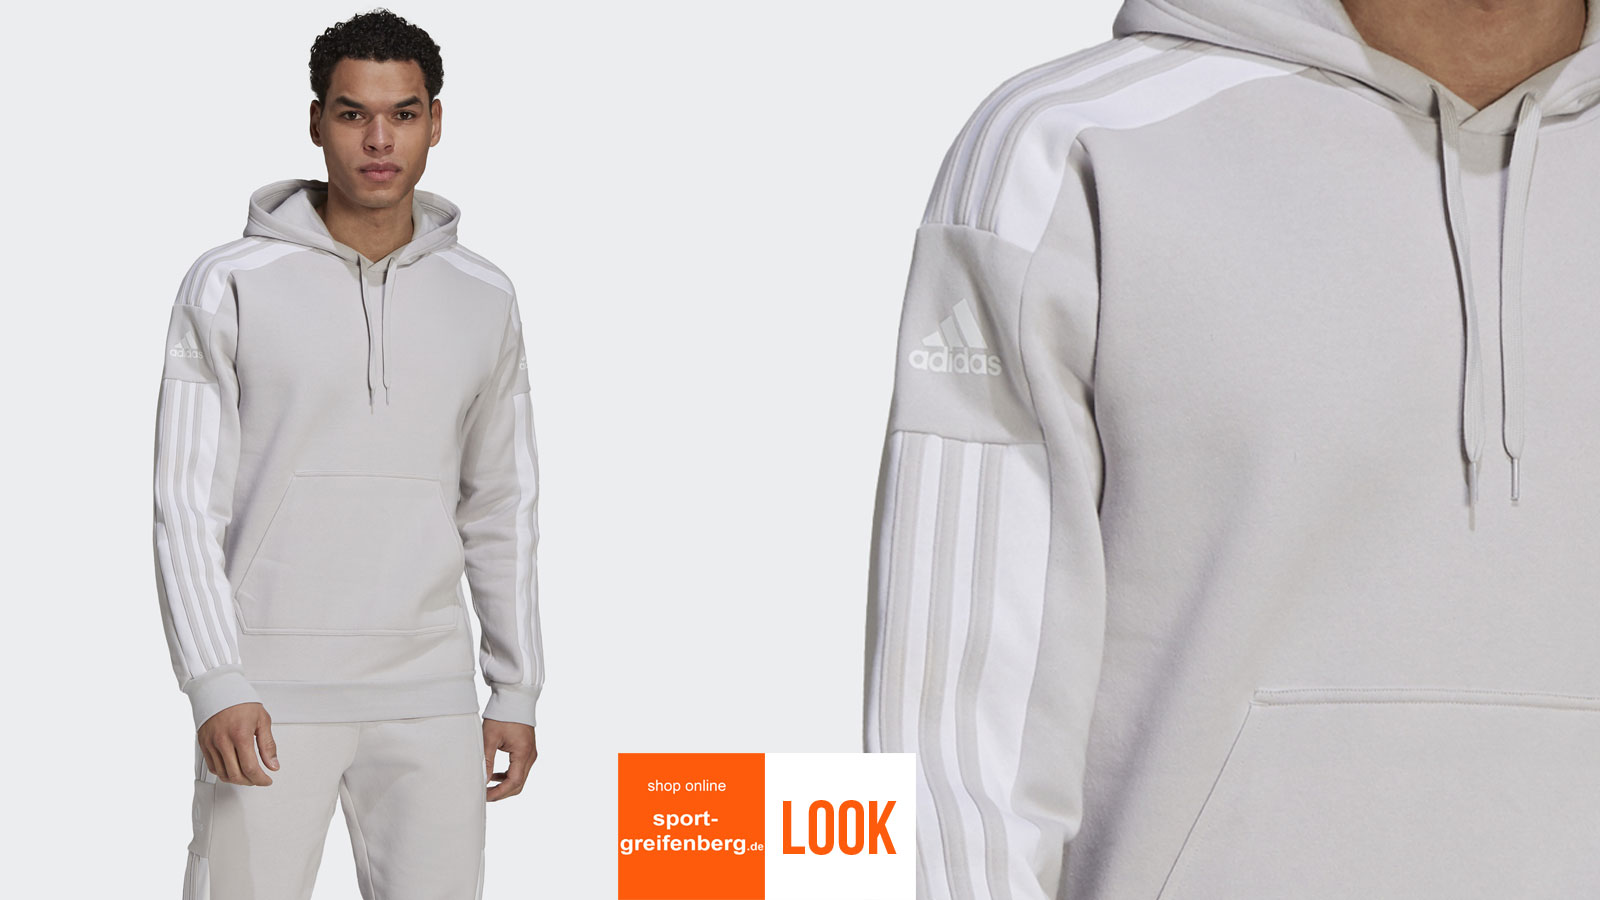 das adidas Sport Lifestyle Outfit Squadra in grau